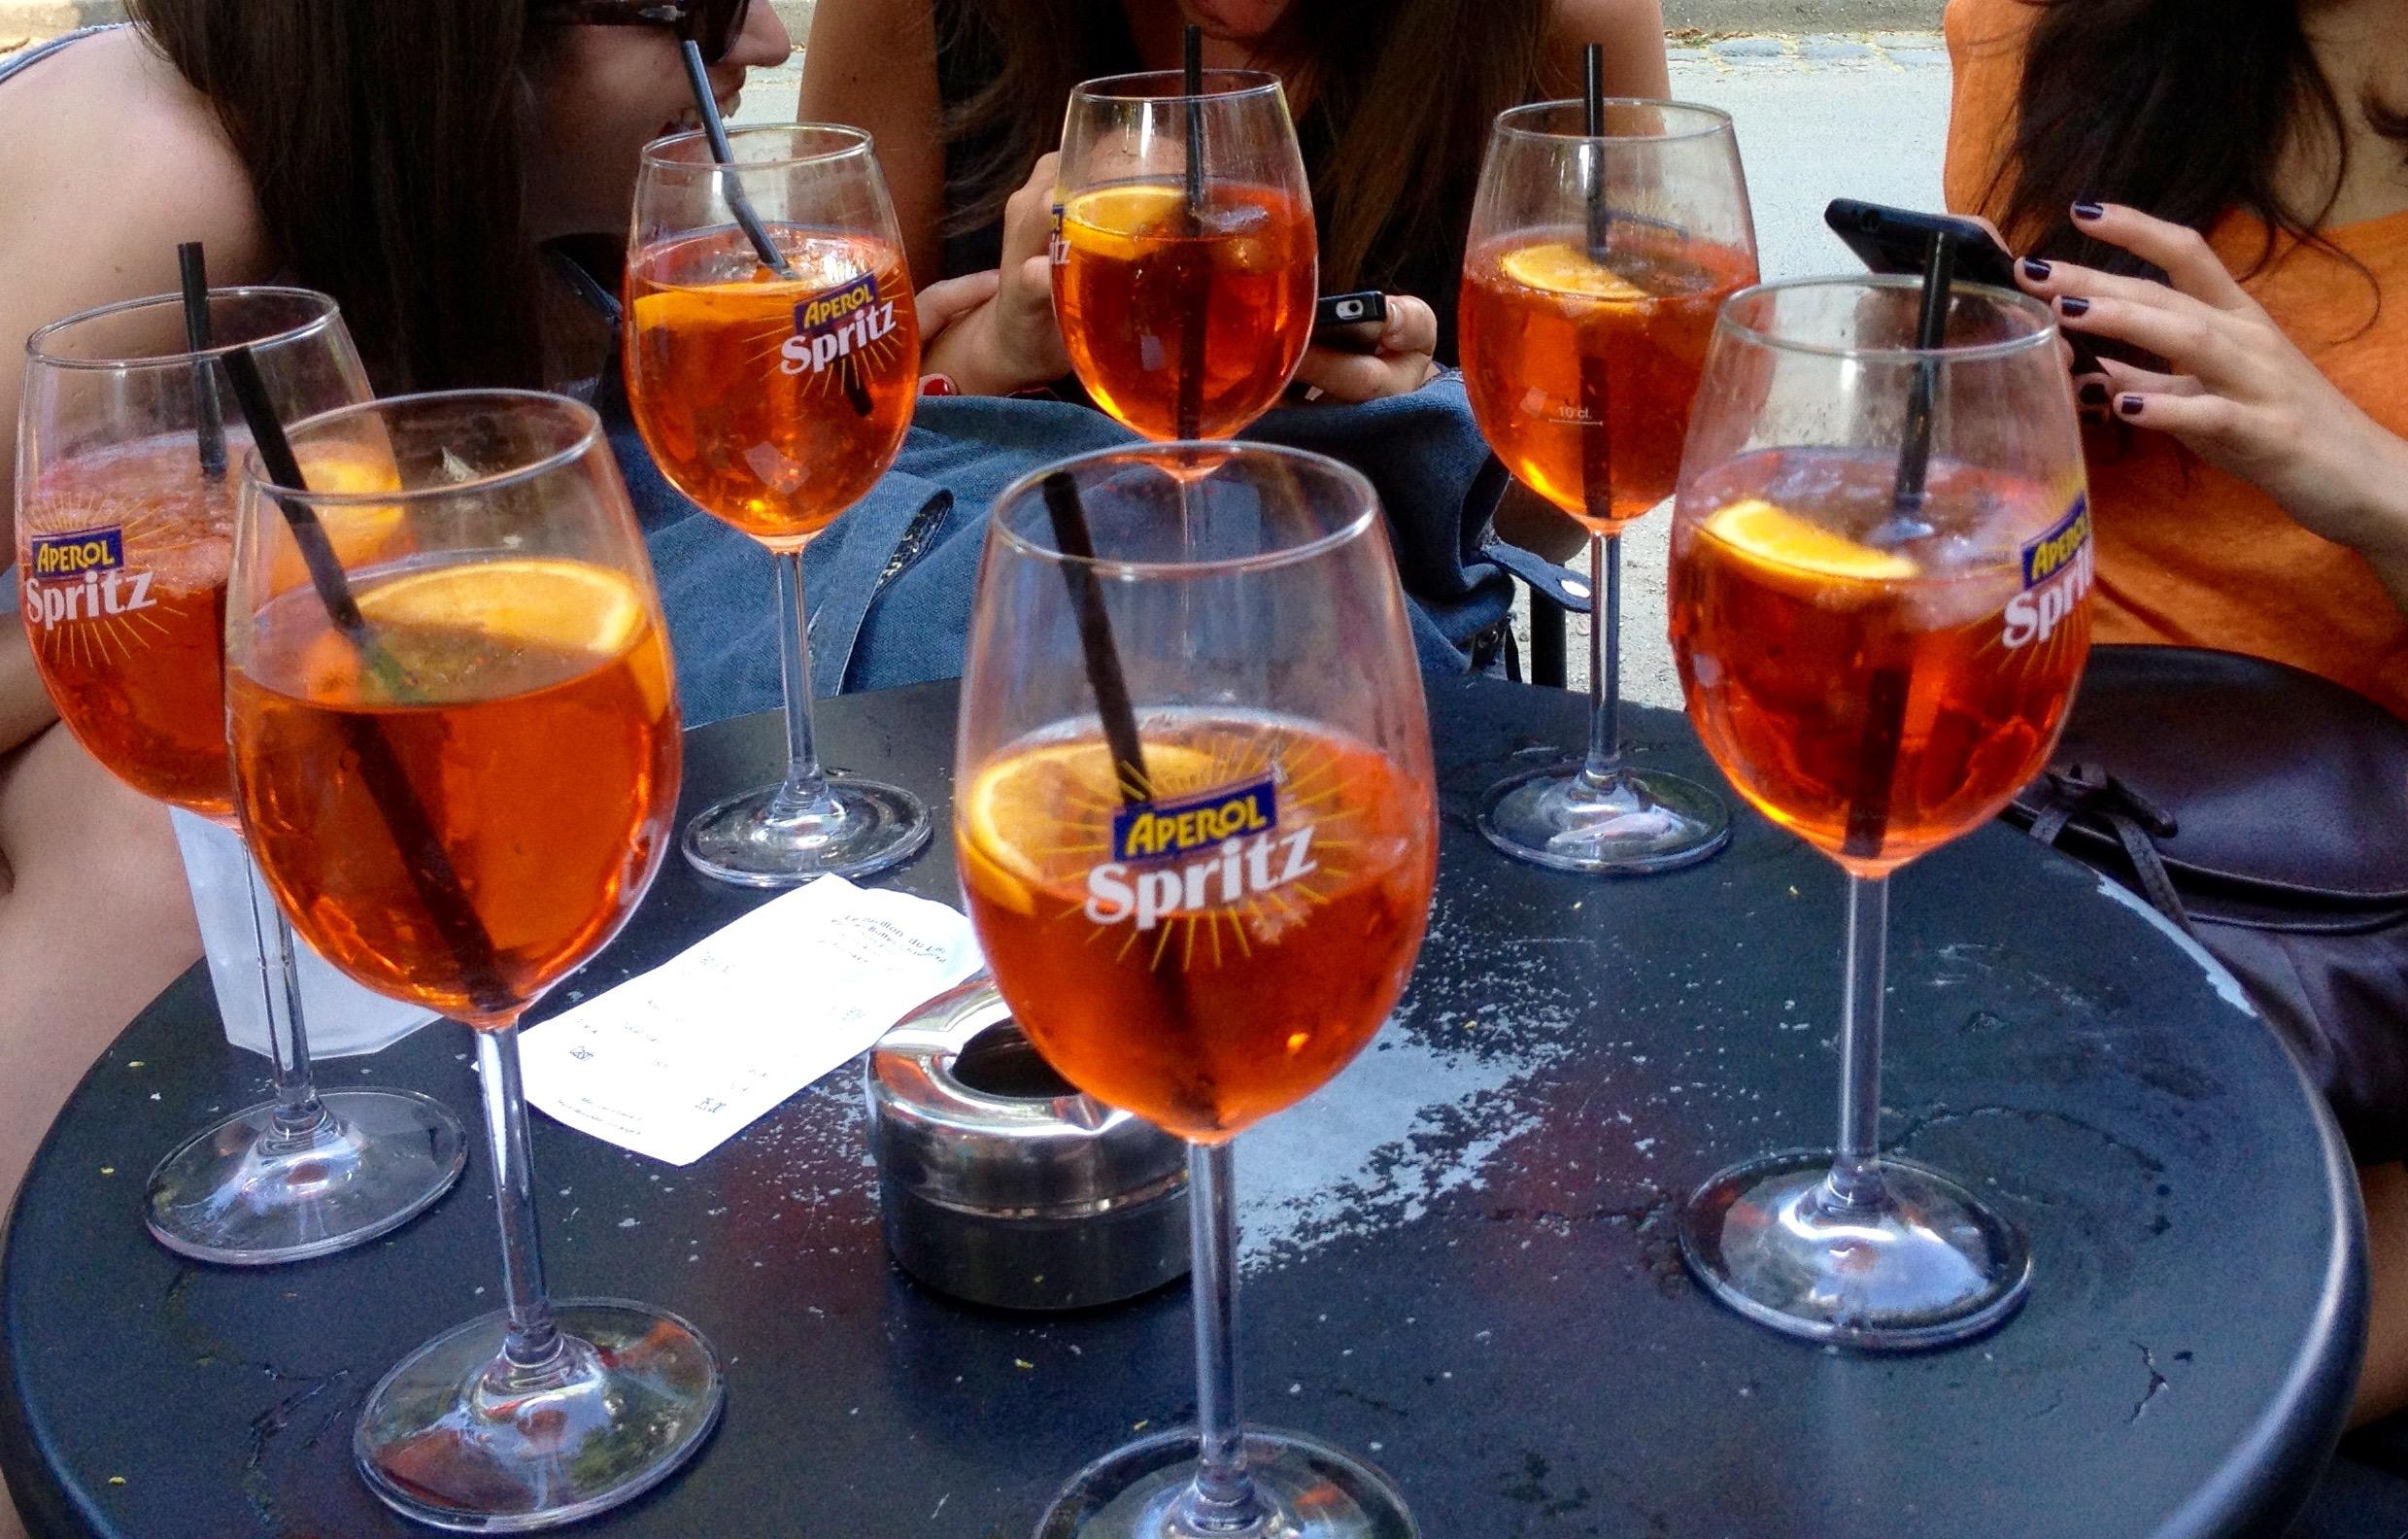 La vie en orange spritz terrazze parigi d 39 estate for Bicchieri aperol spritz